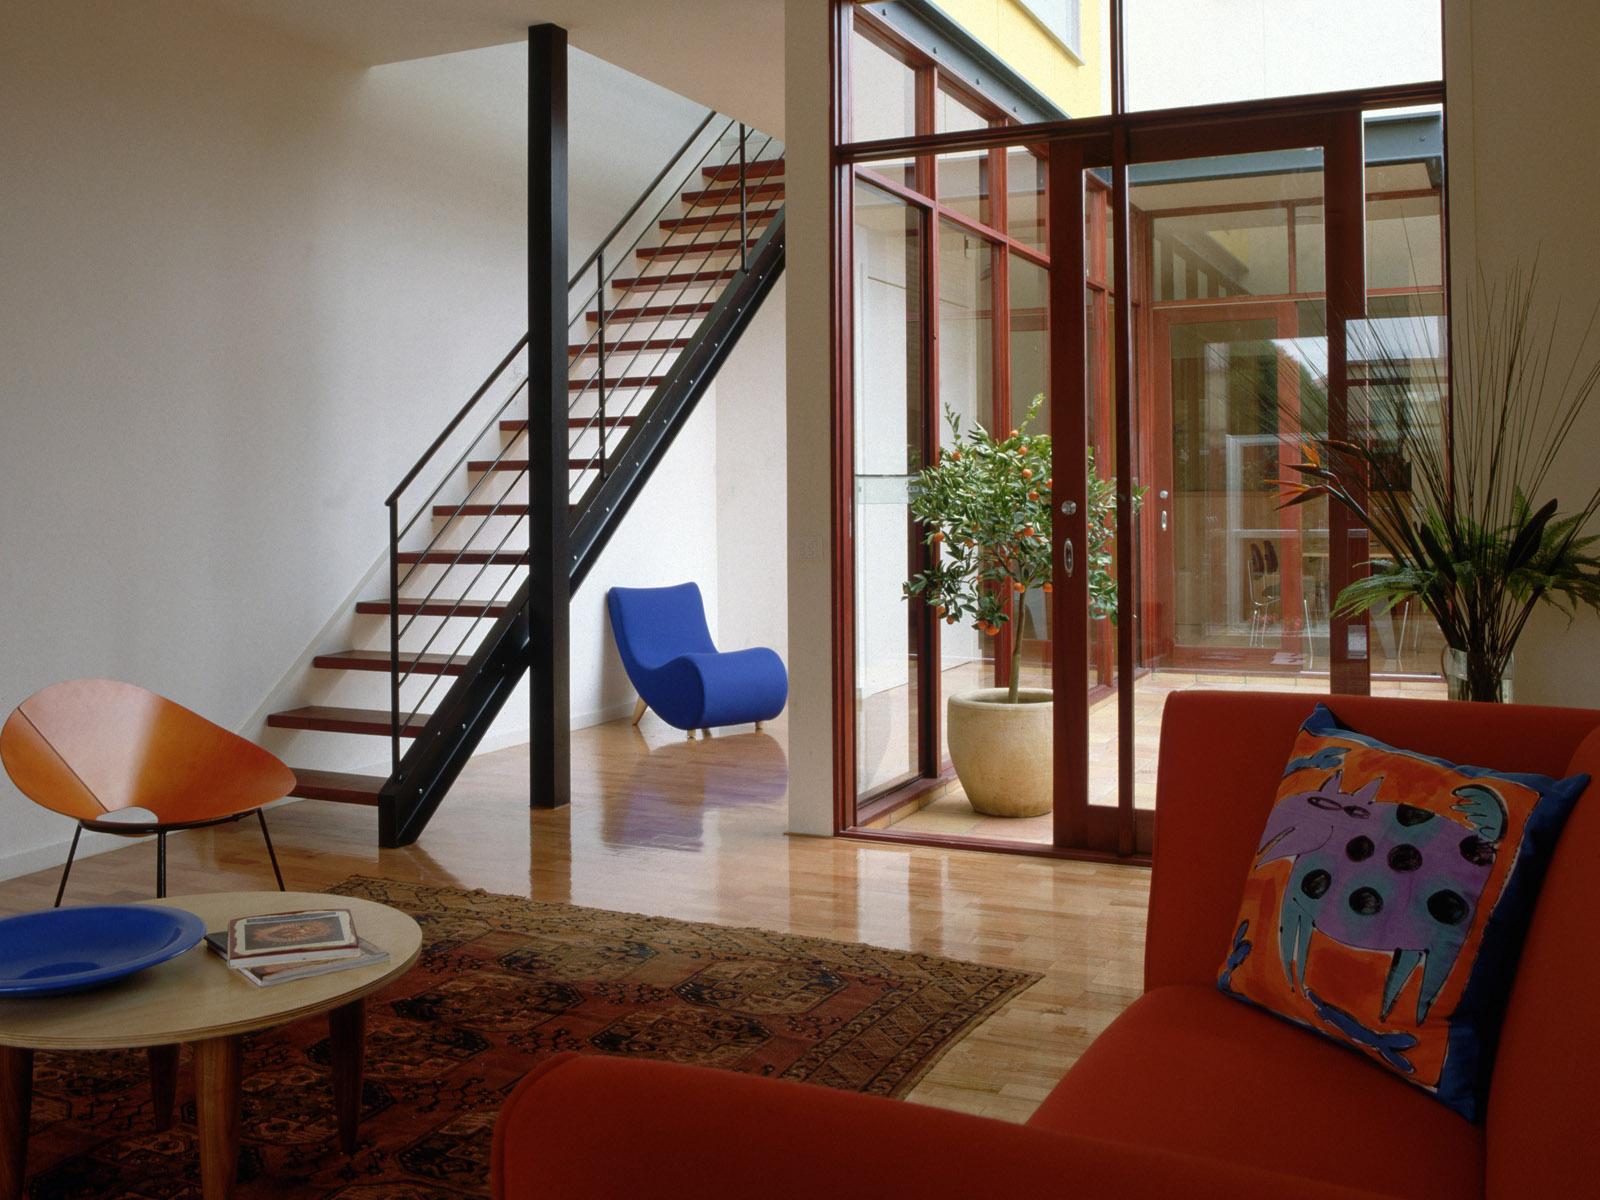 http://2.bp.blogspot.com/_C4L8XftIrHU/S8Pyg3uNH4I/AAAAAAAAEzo/Dhi91Y21yss/s1600/Interior+Design+Ideas+%283%29.jpg